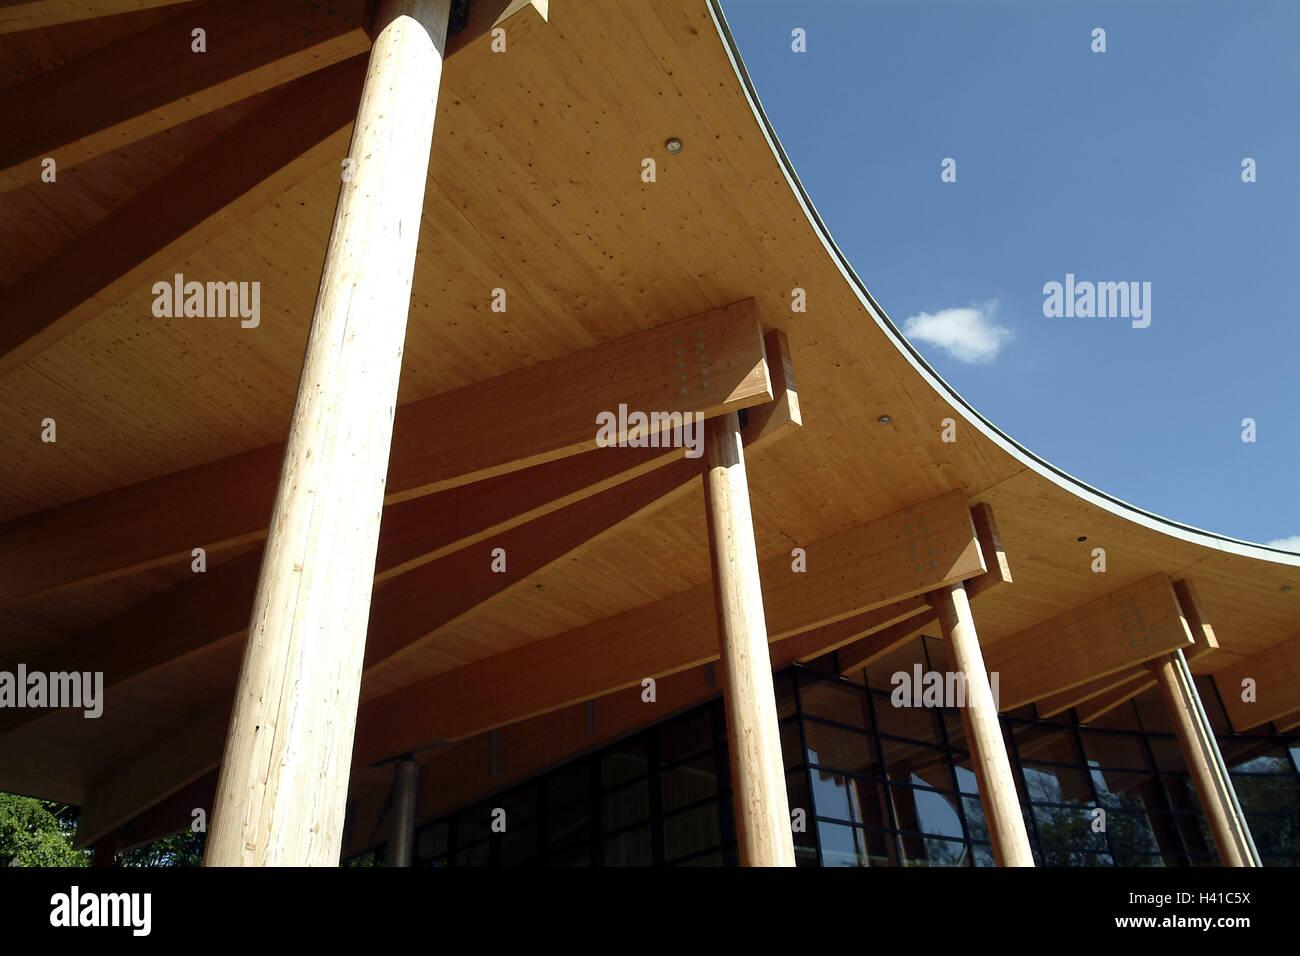 Germany, Saarland, Orscholz, Cloef atrium, detail, roof, wooden